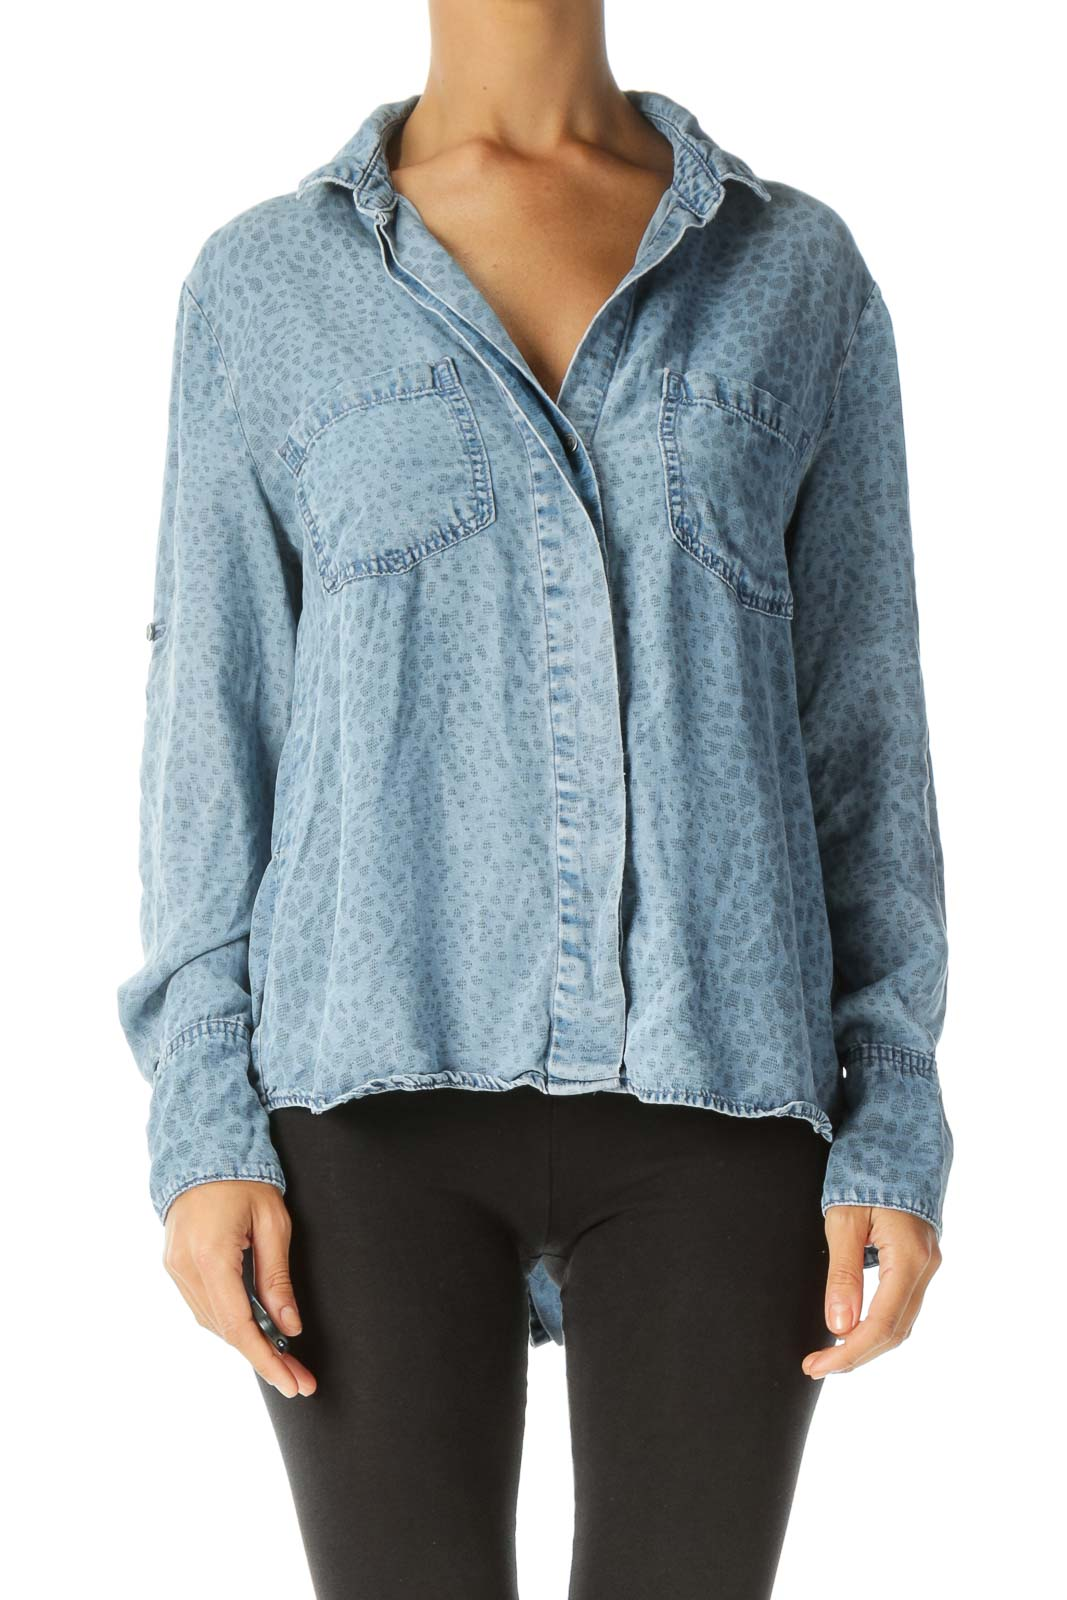 Blue Printed Light-Wash Pocketed Light Faux-Denim Shirt